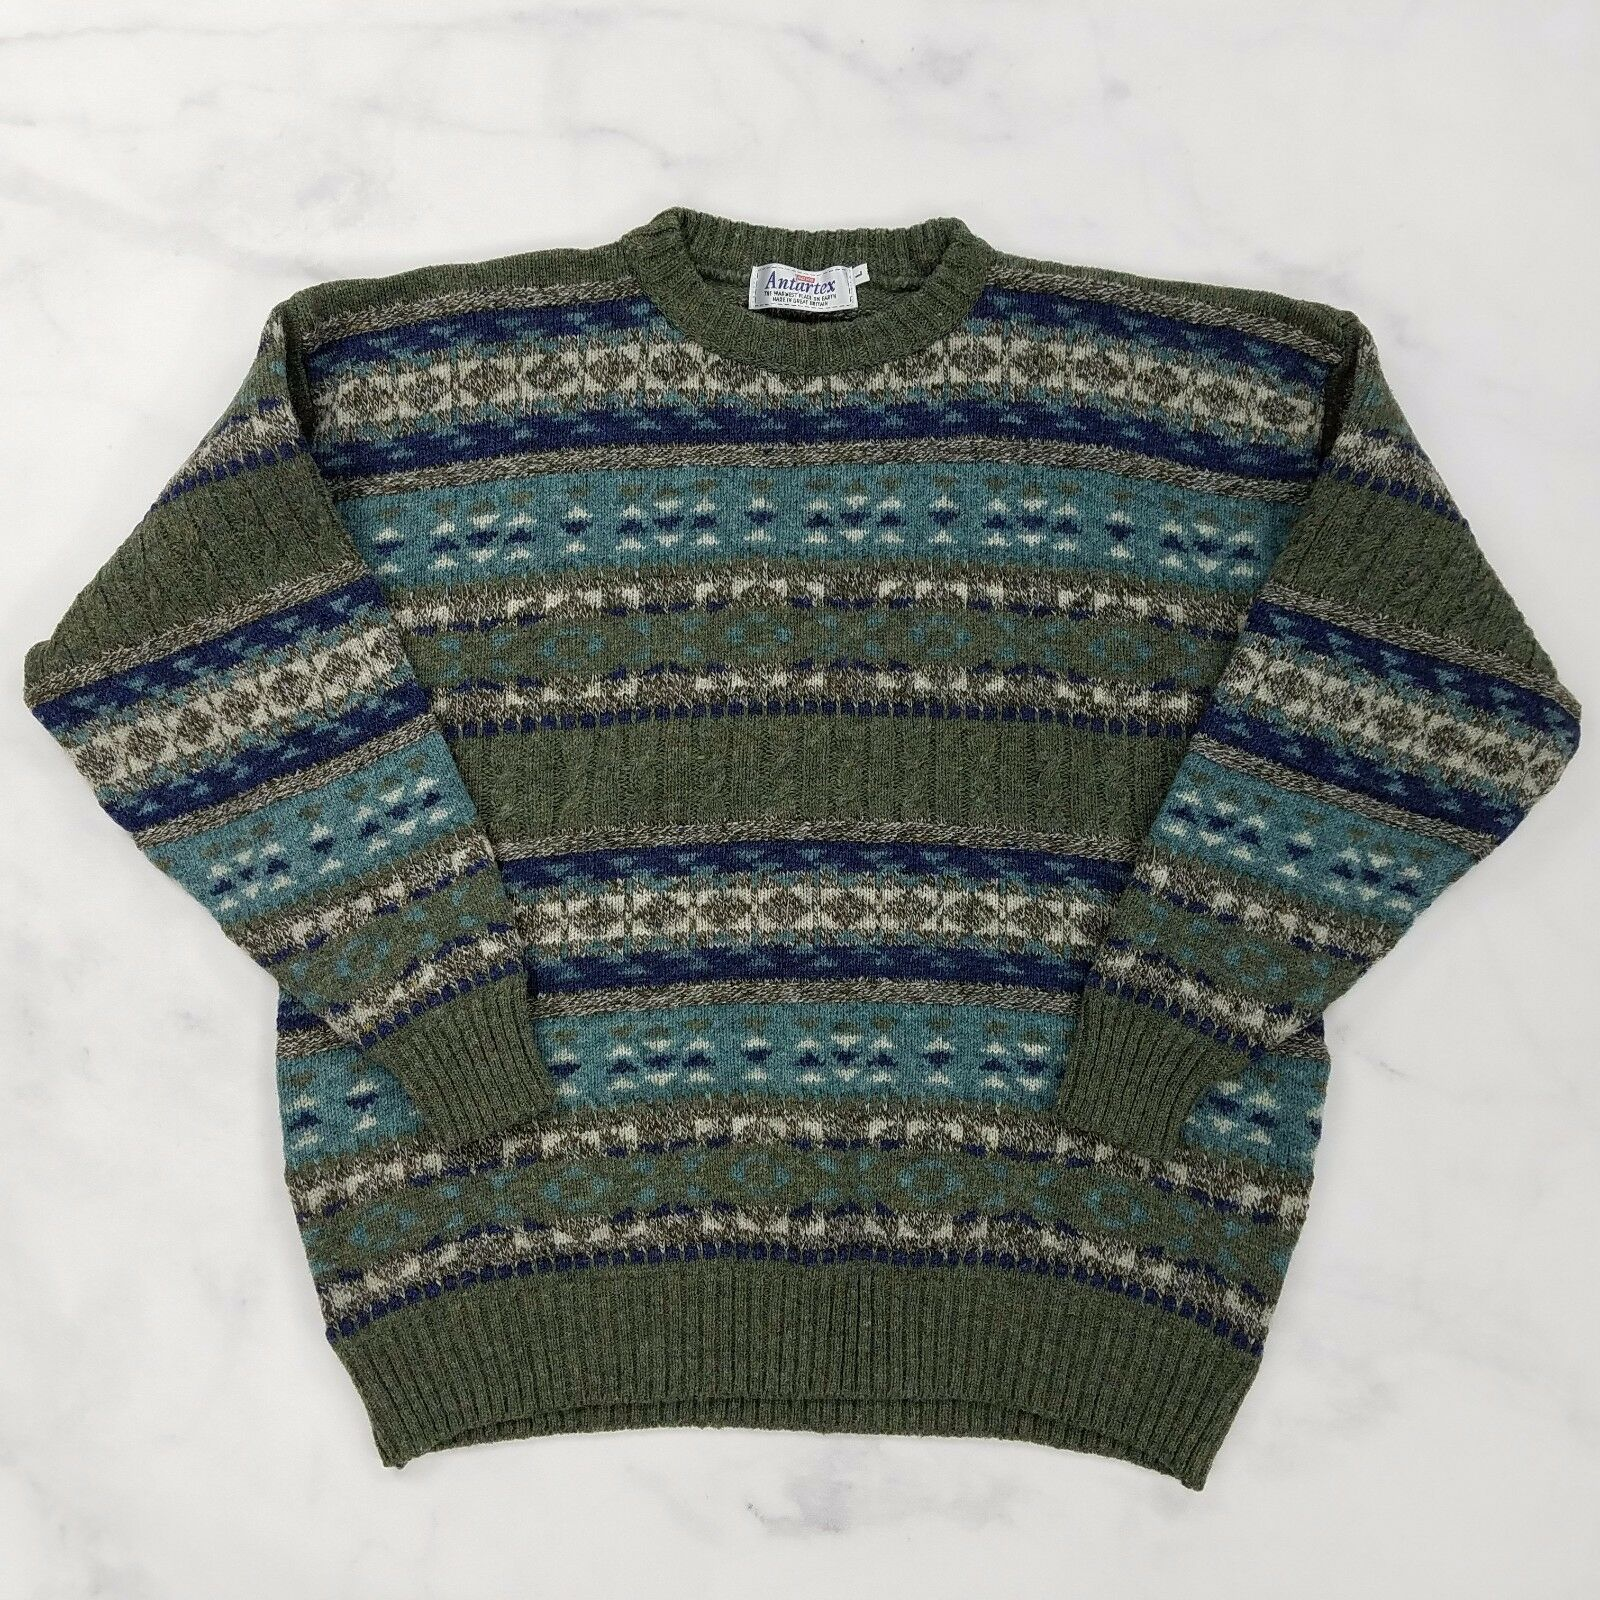 Antartex Shetland Wool bluee Green Fair Isle Sweater, Mens Large (Britain Made)